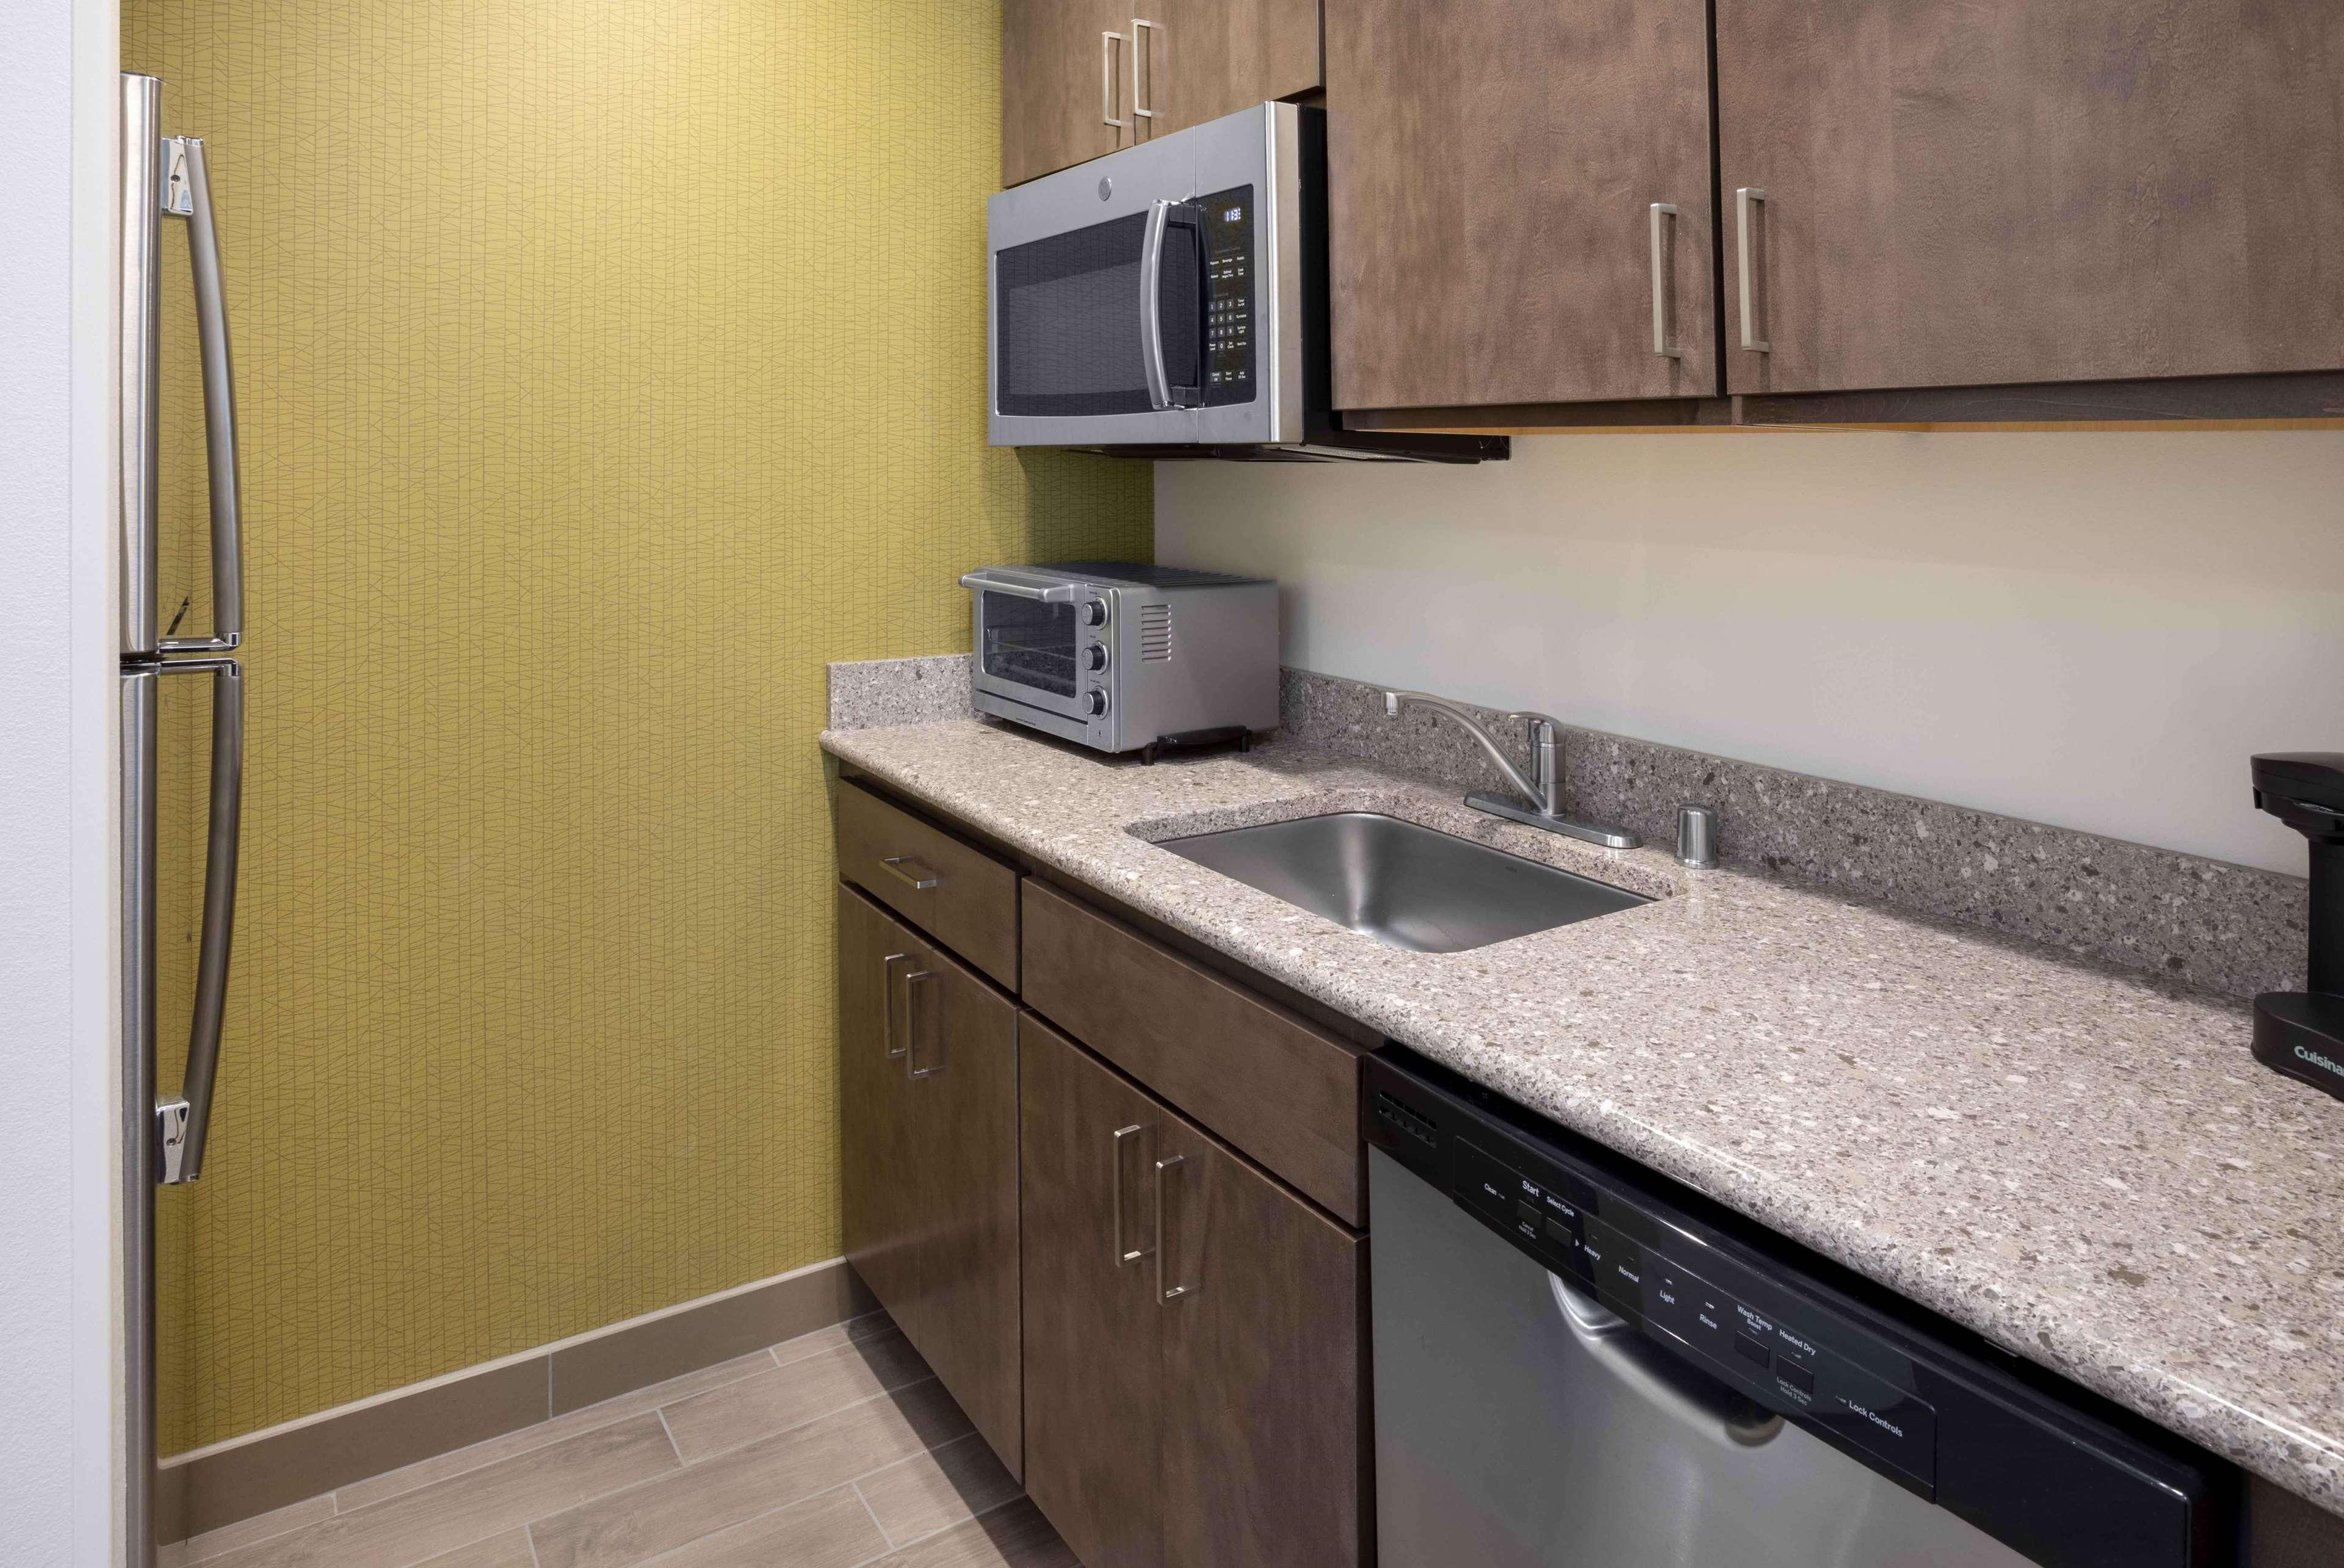 Homewood Suites by Hilton Edina Minneapolis image 21